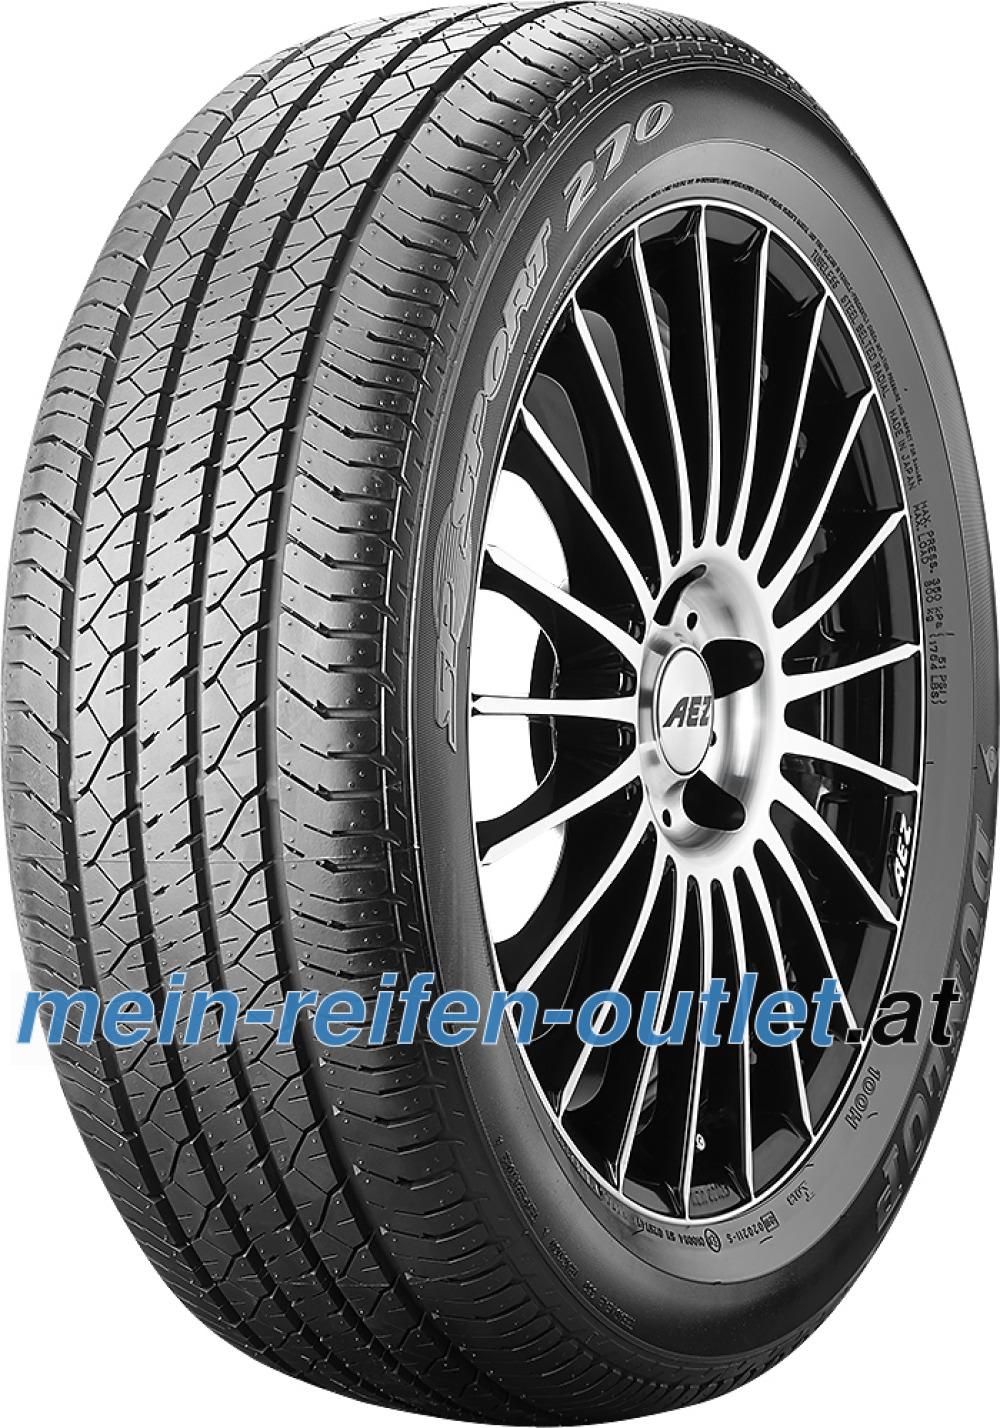 Dunlop SP Sport 270 ( 215/65 R16 98H )